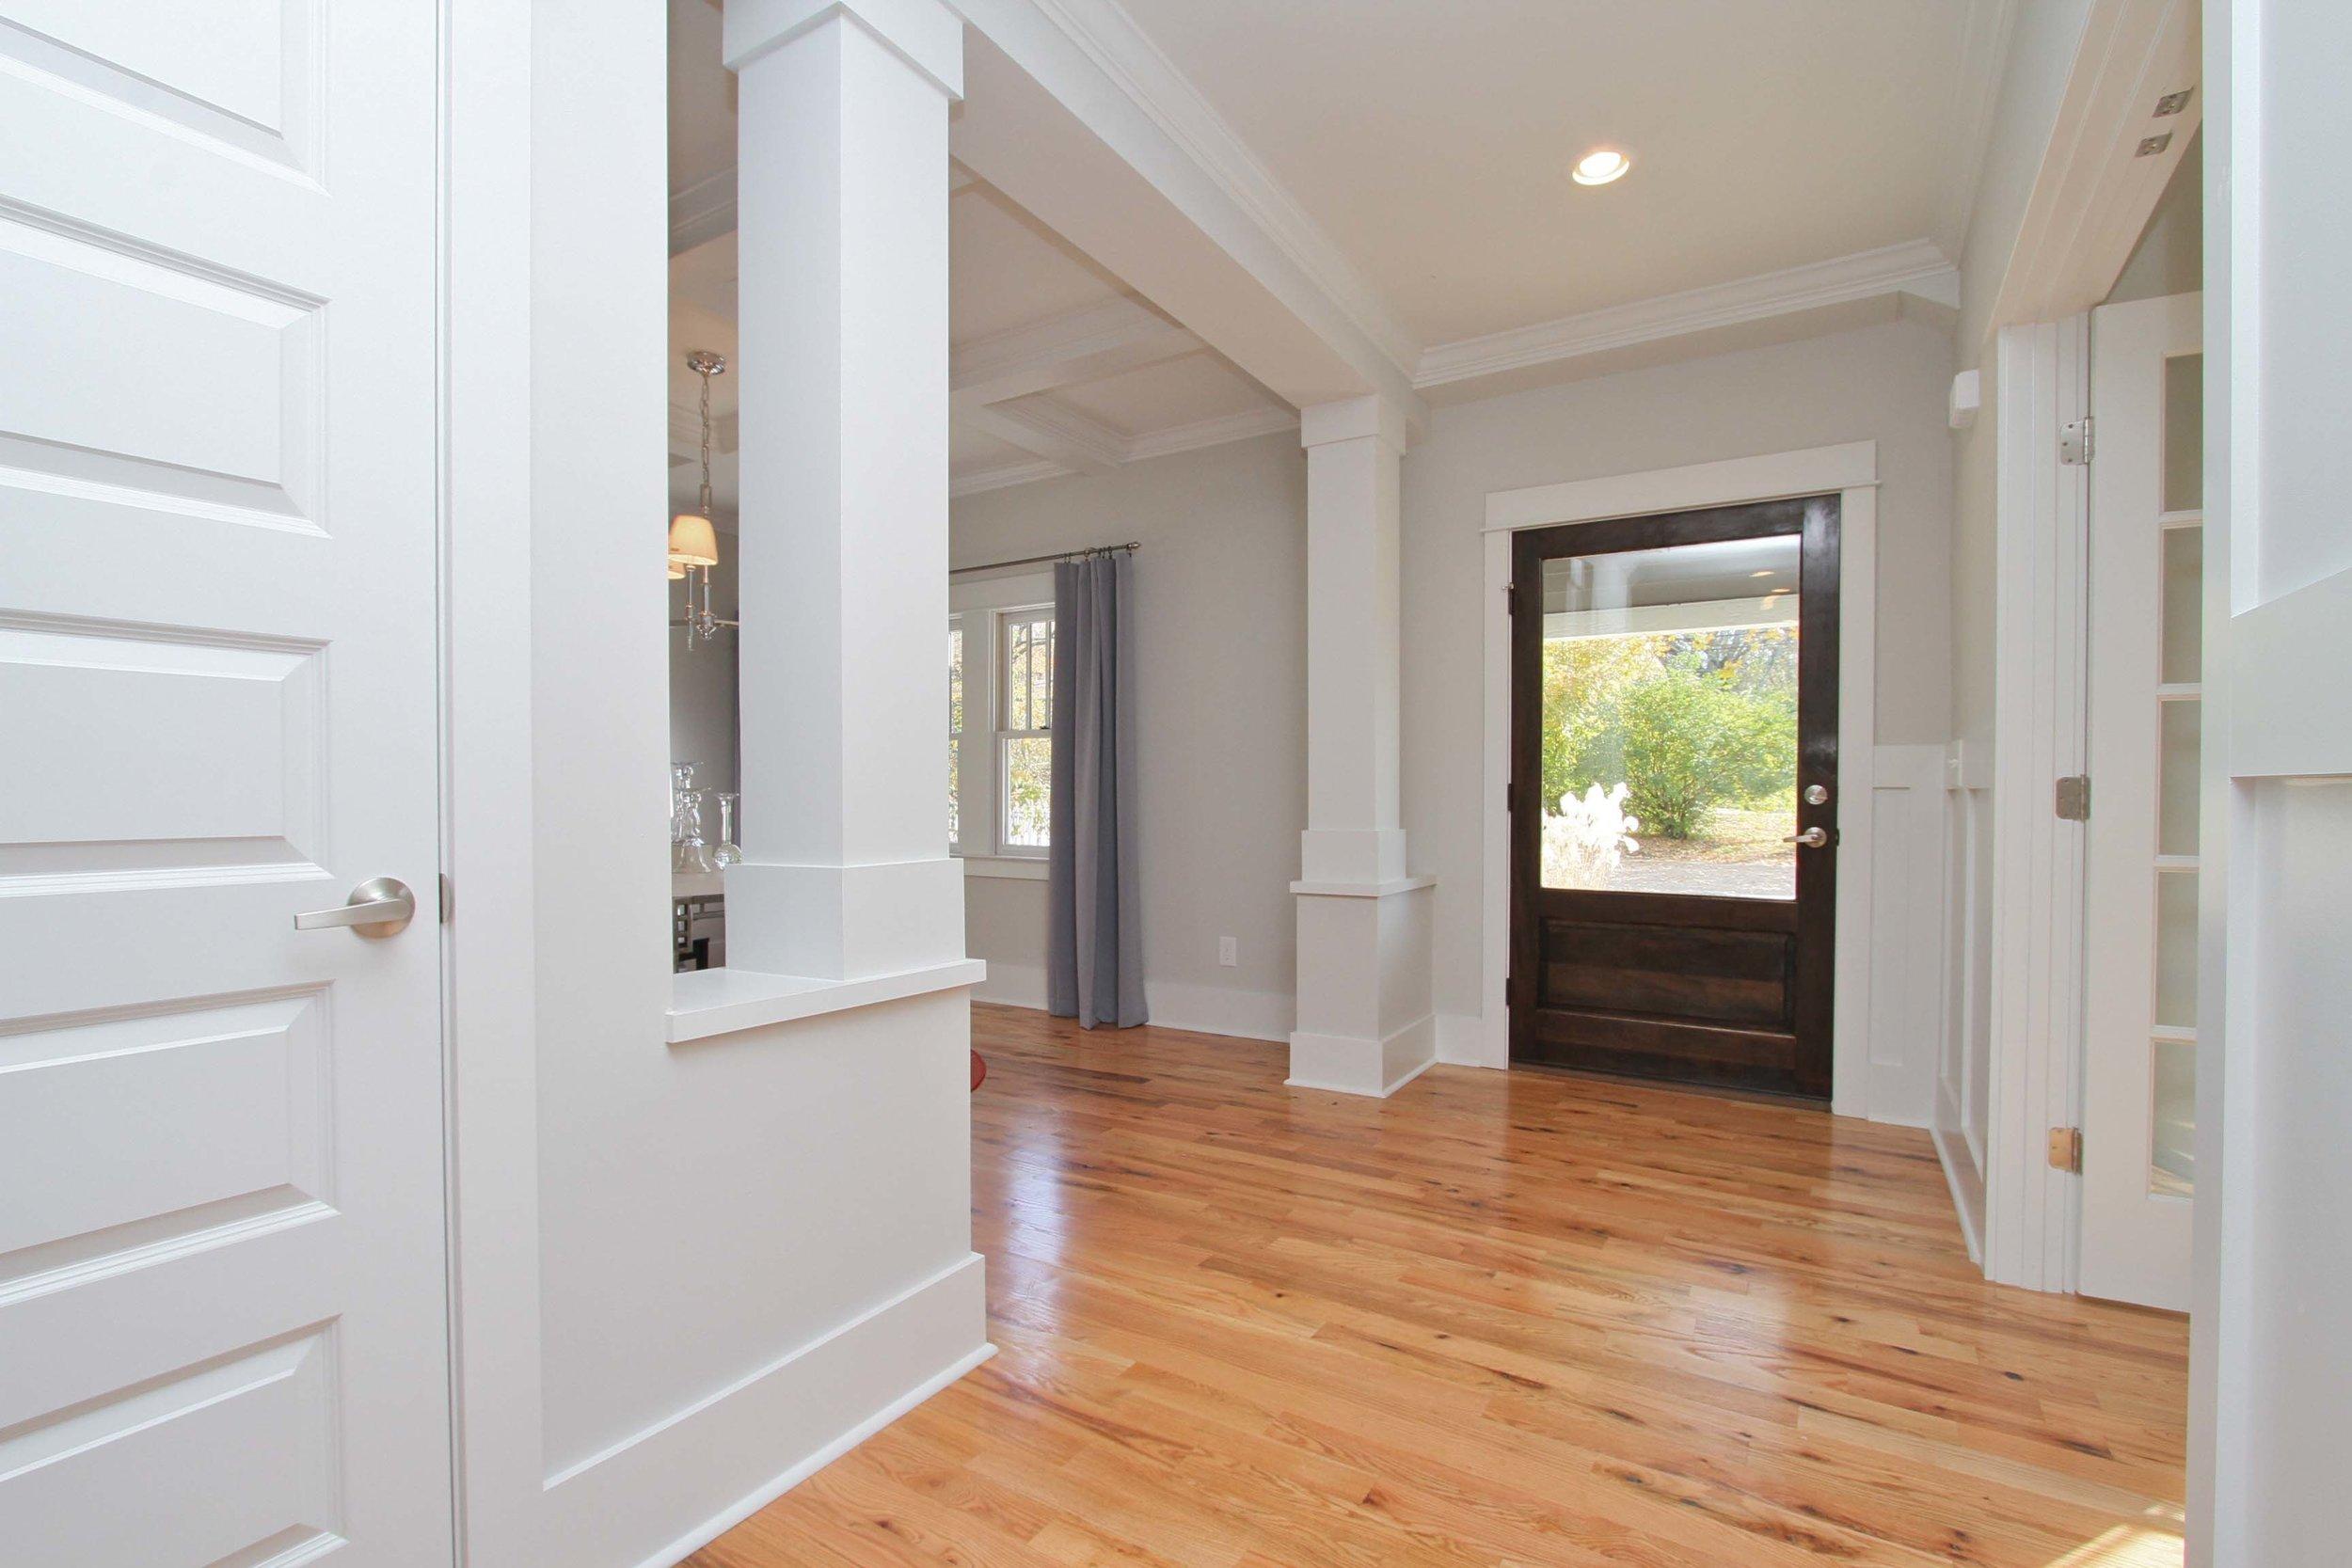 House-Plans-Online-Historic-Nashville-Peggy-Newman-Renovation-Columns-Entry-Murphy.jpg